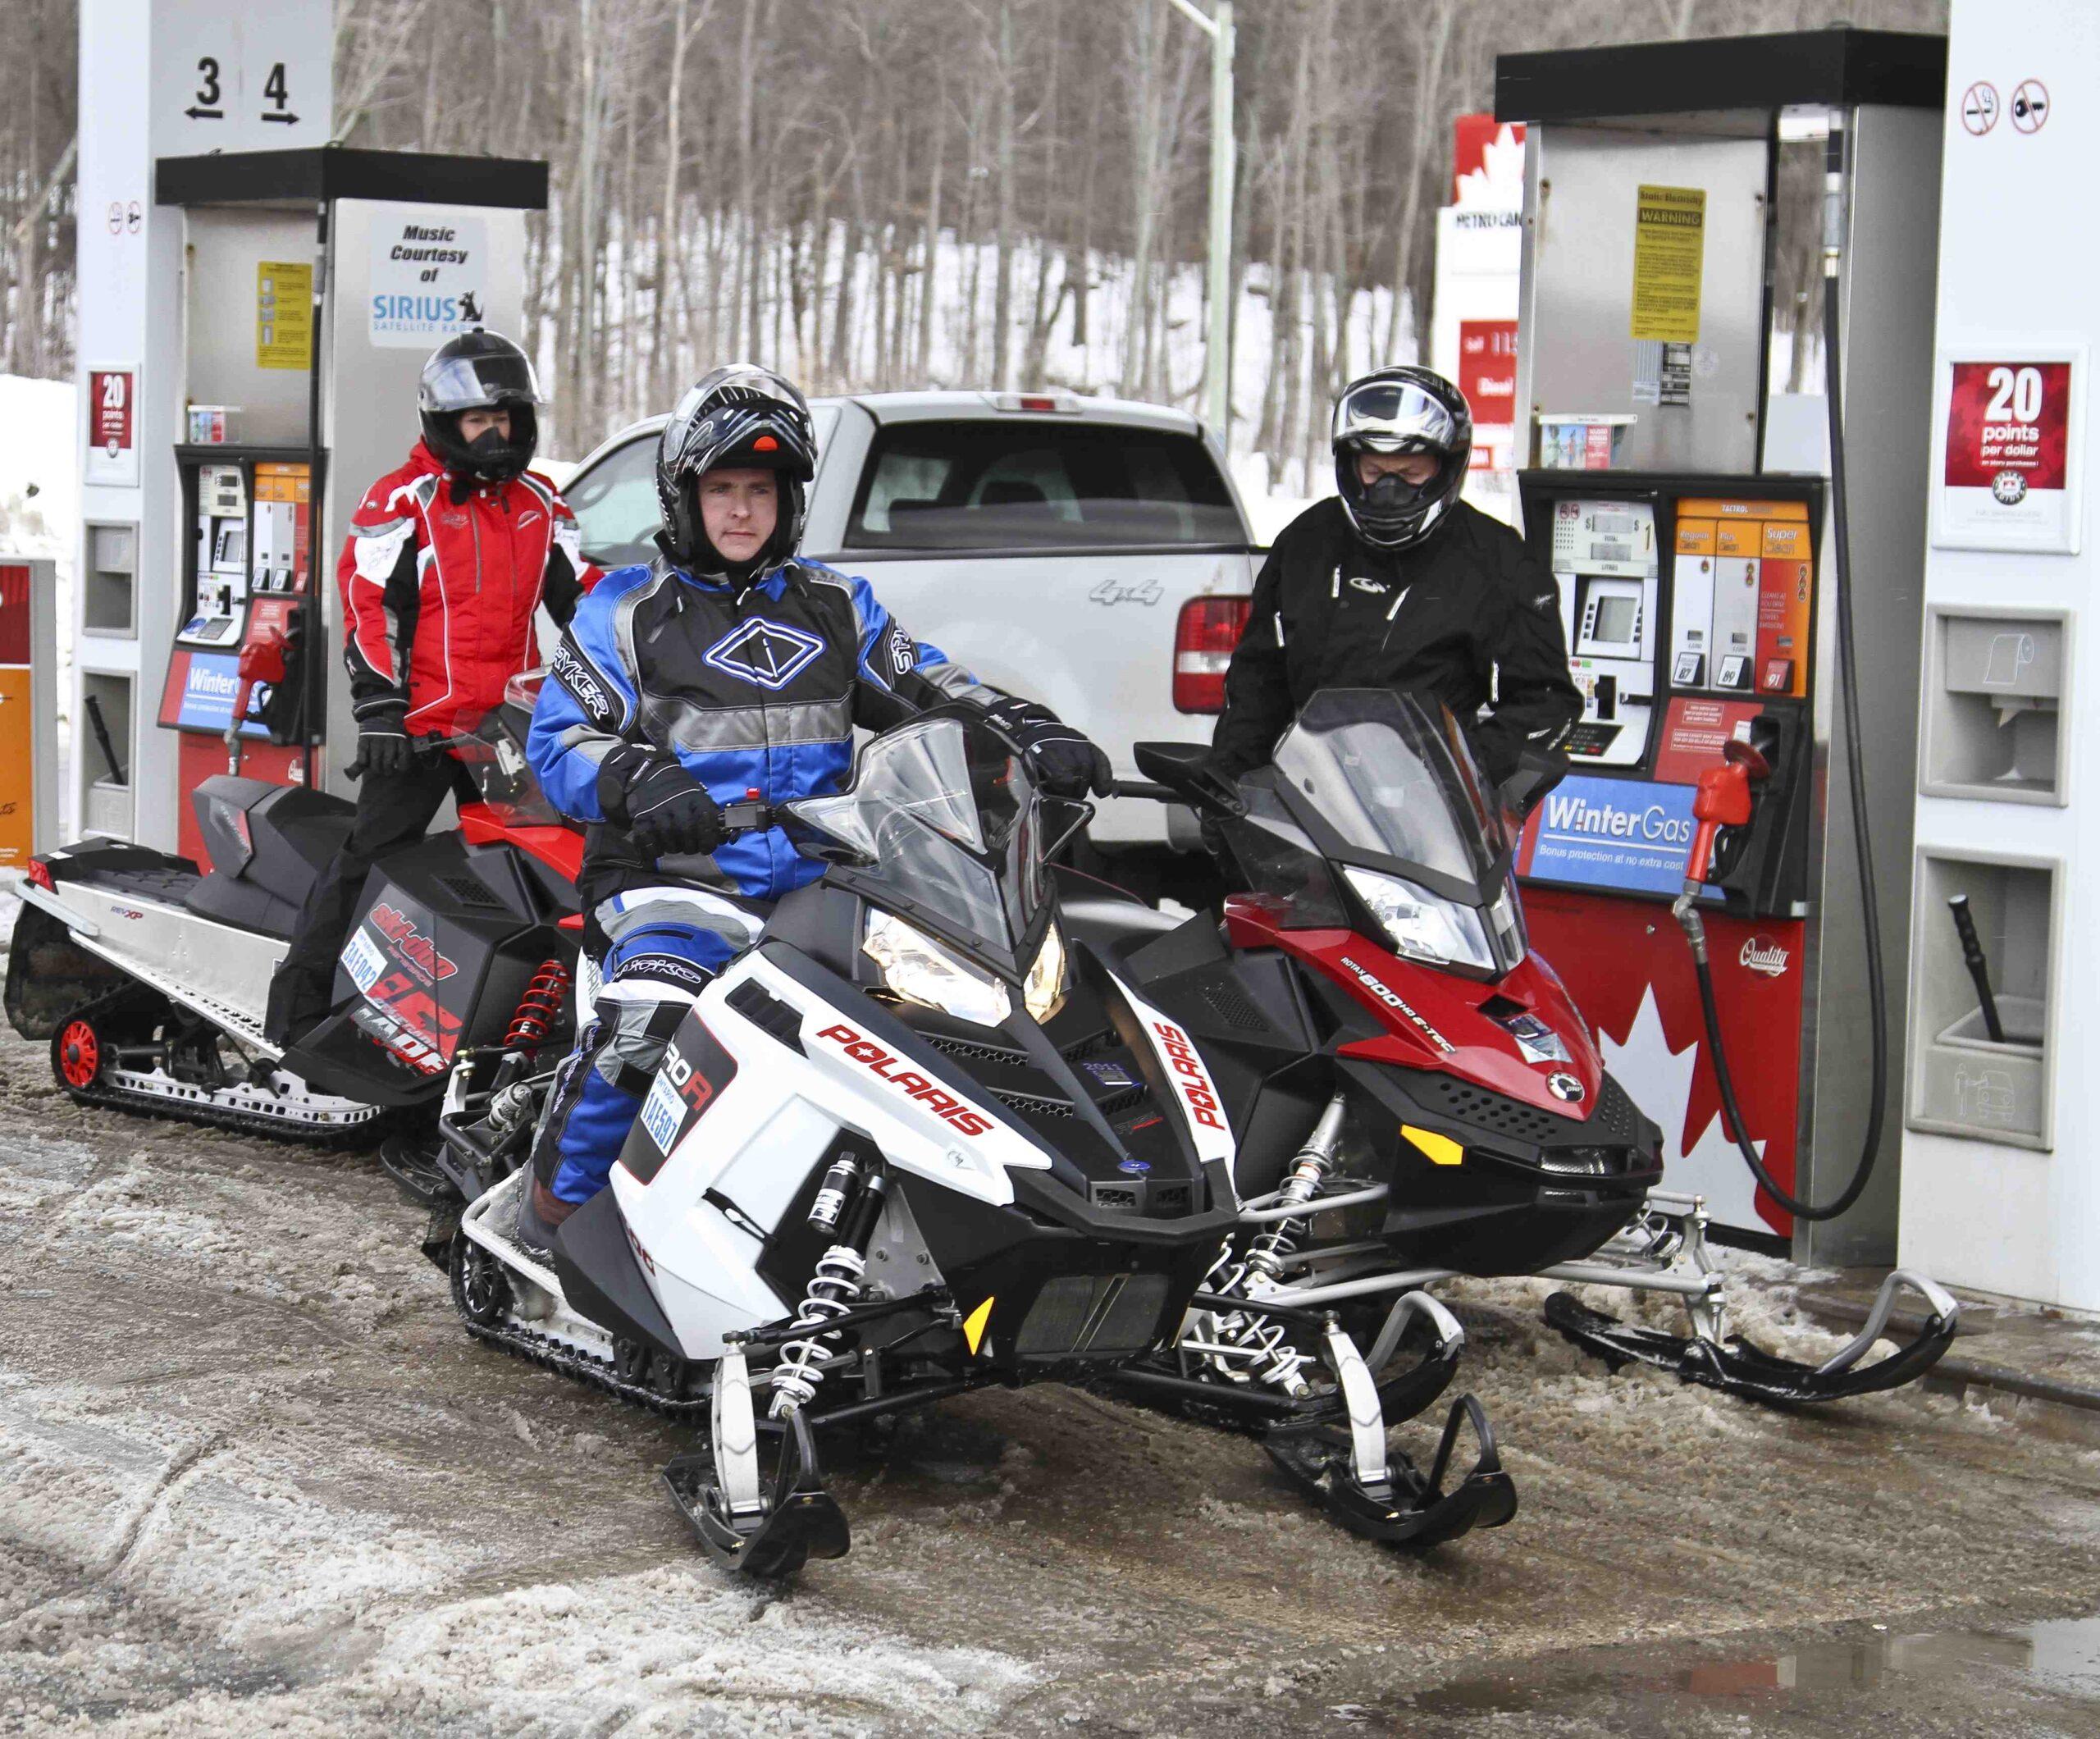 Snowmobile Pavement Riding Tips